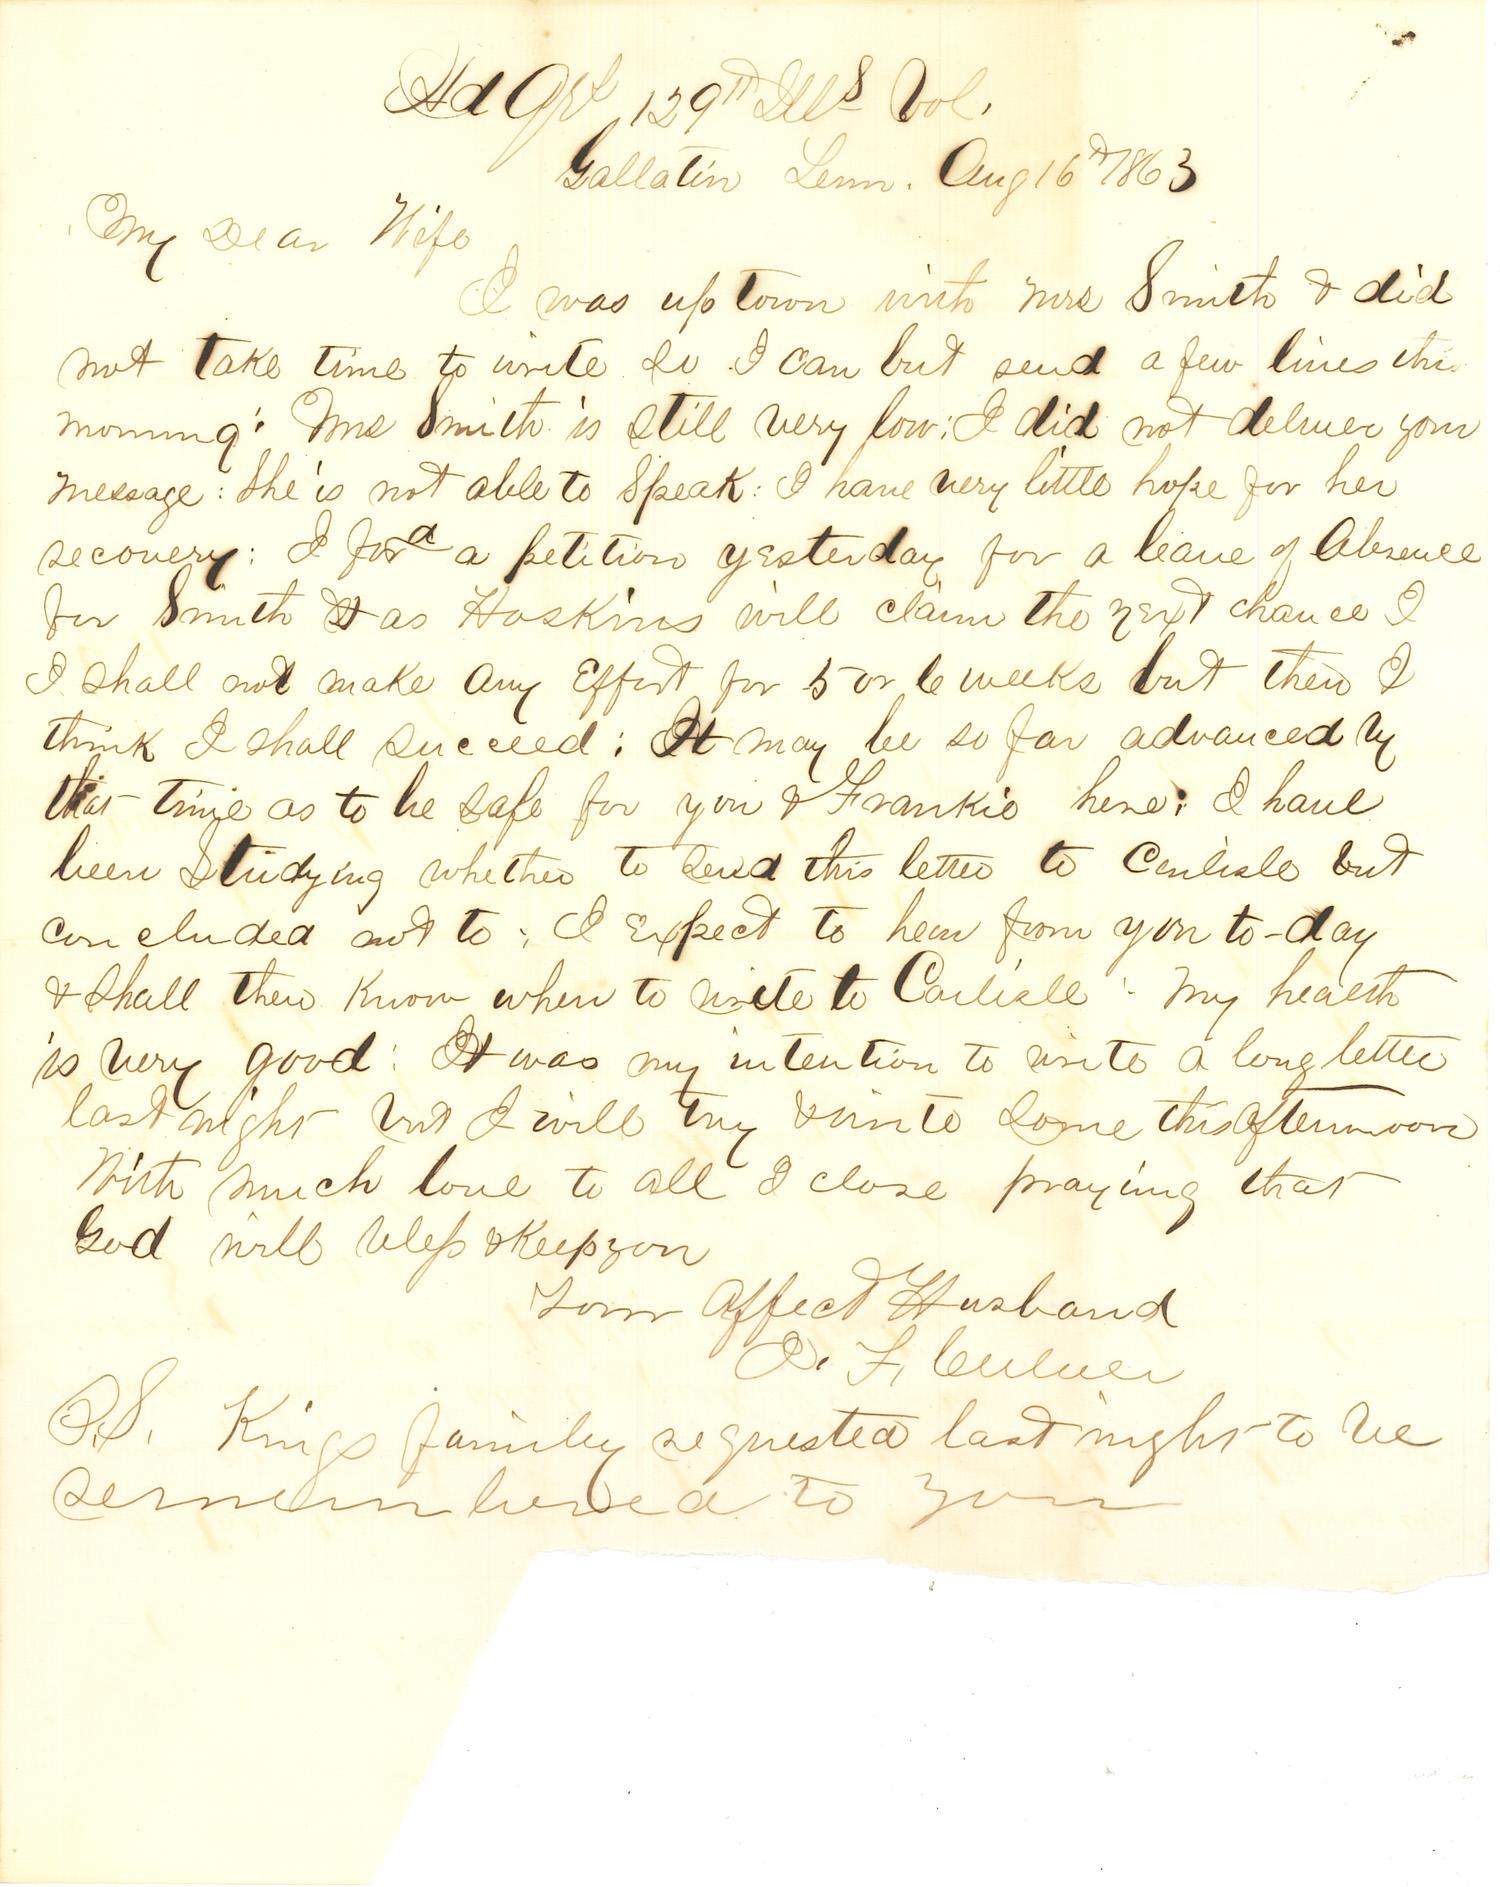 Joseph Culver Letter, August 16, 1863, Page 1